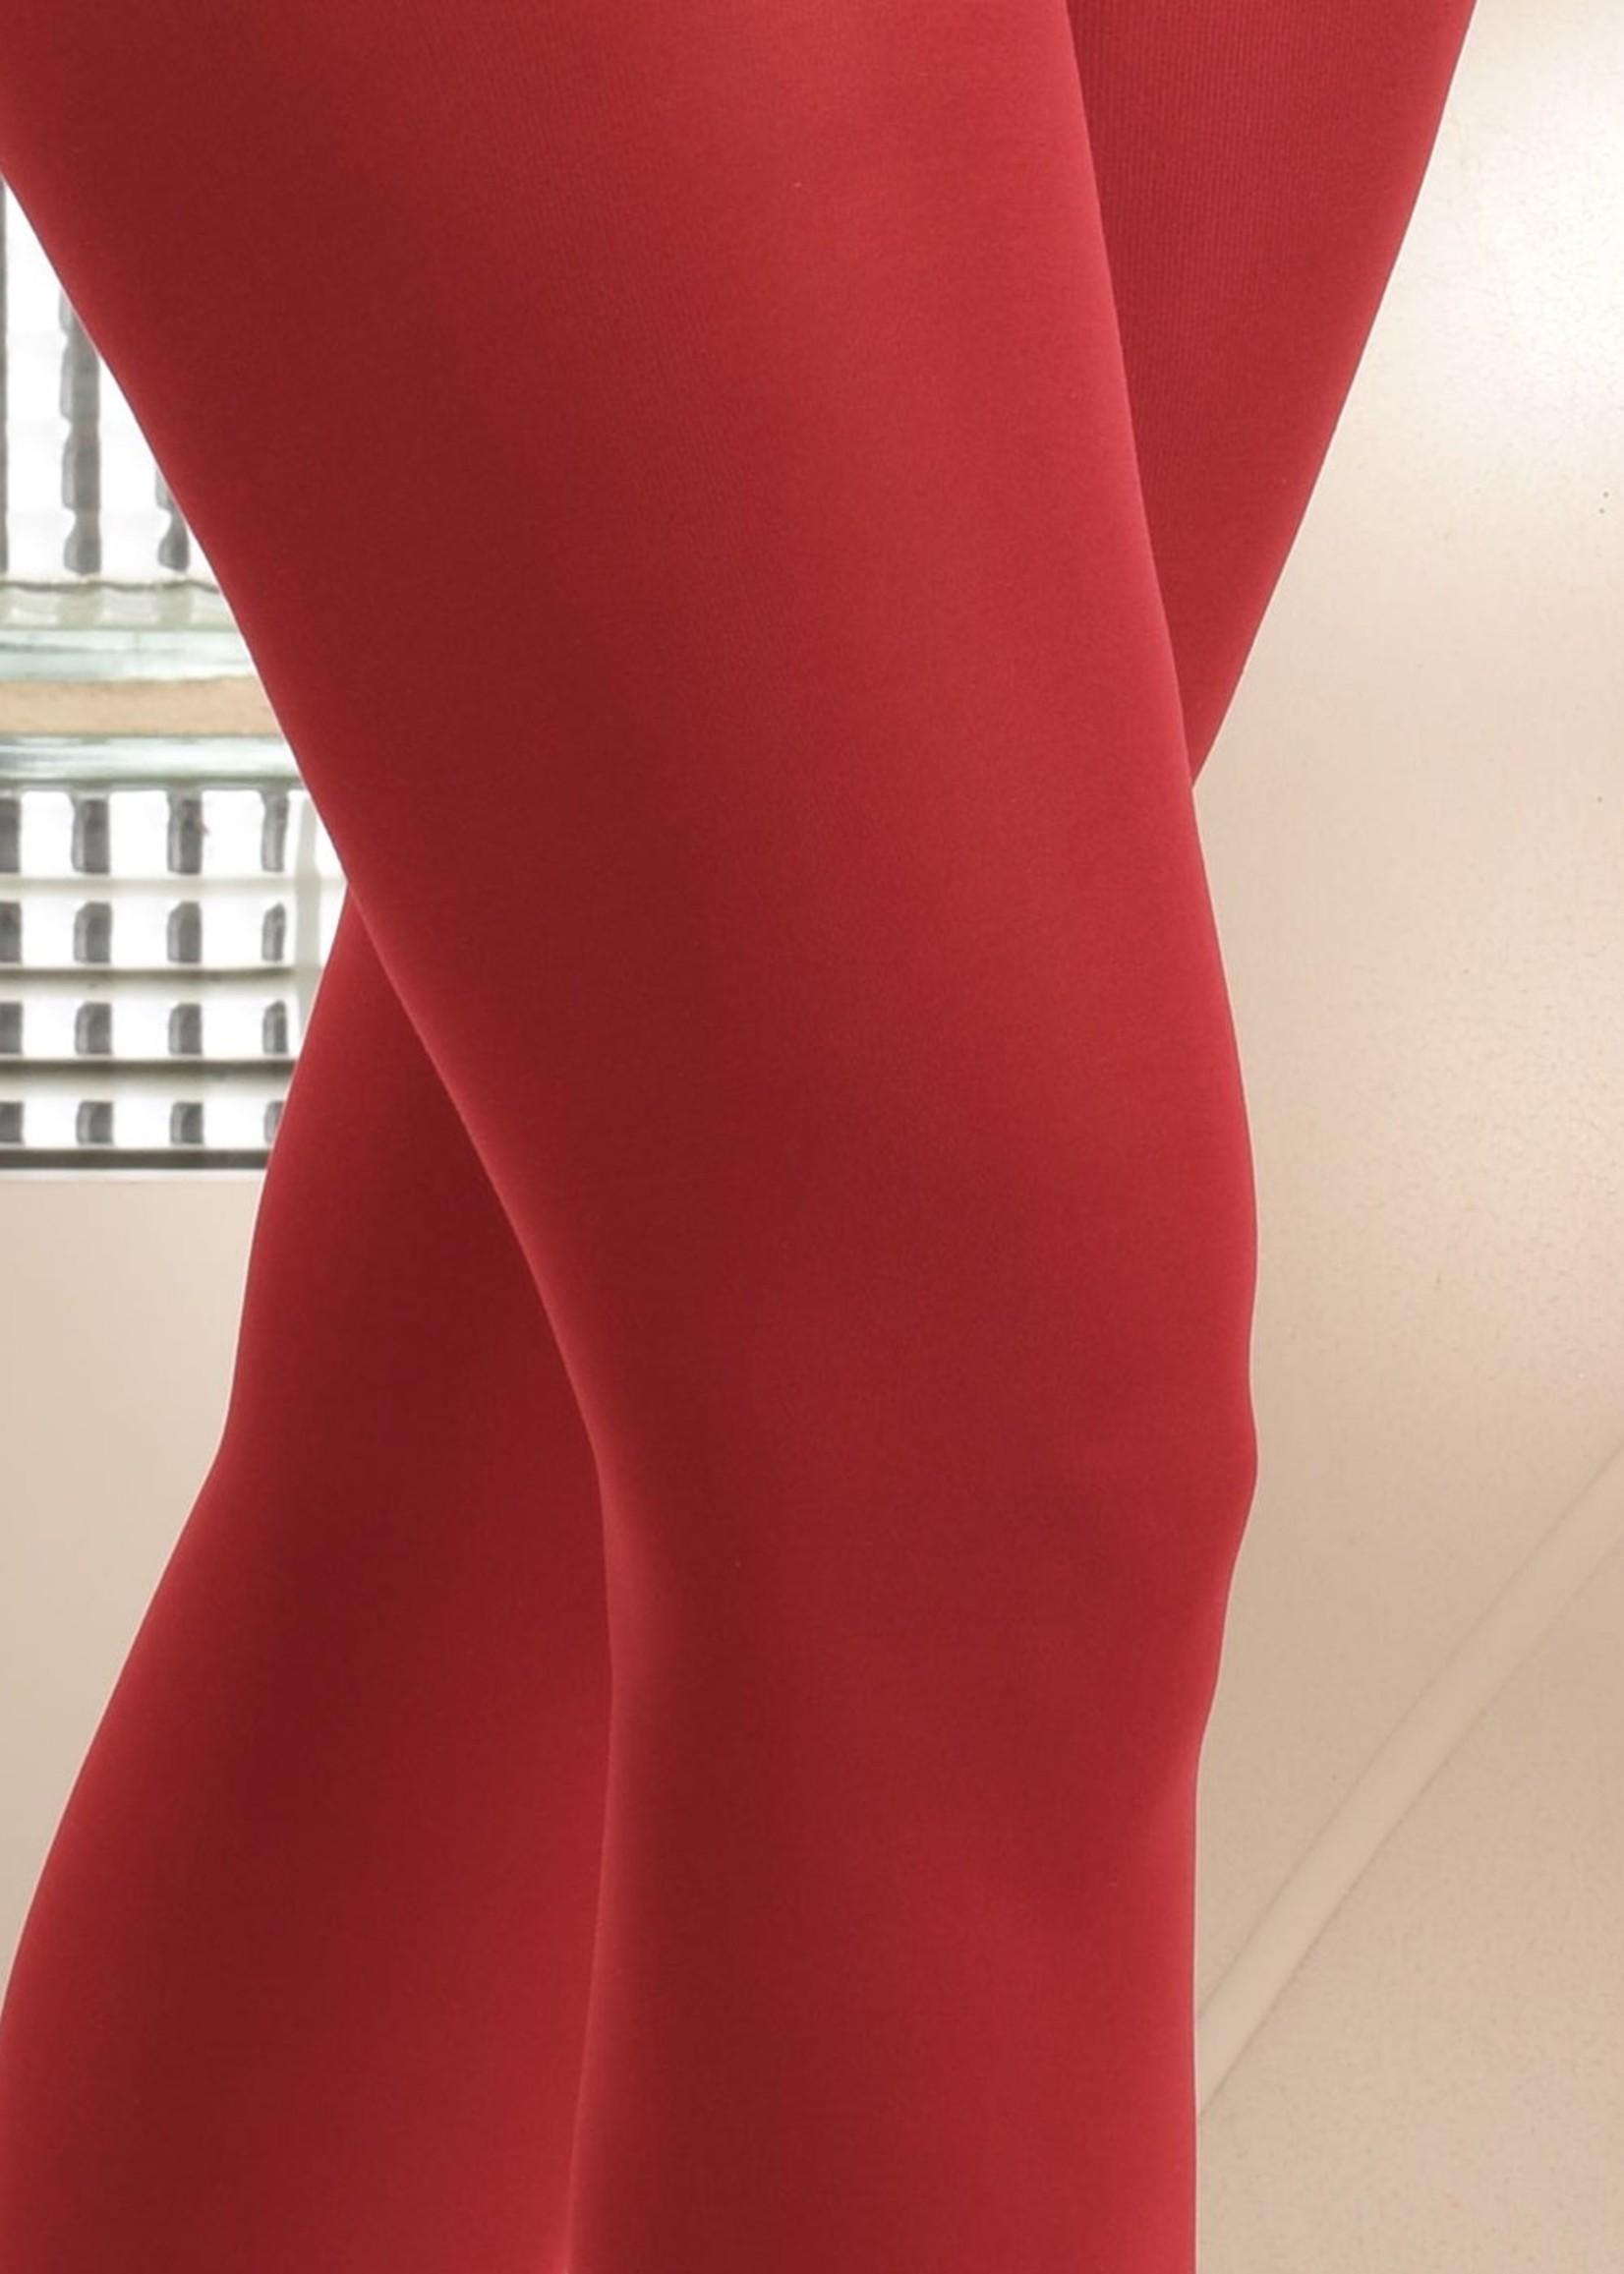 MAMSY Tights 60den Red